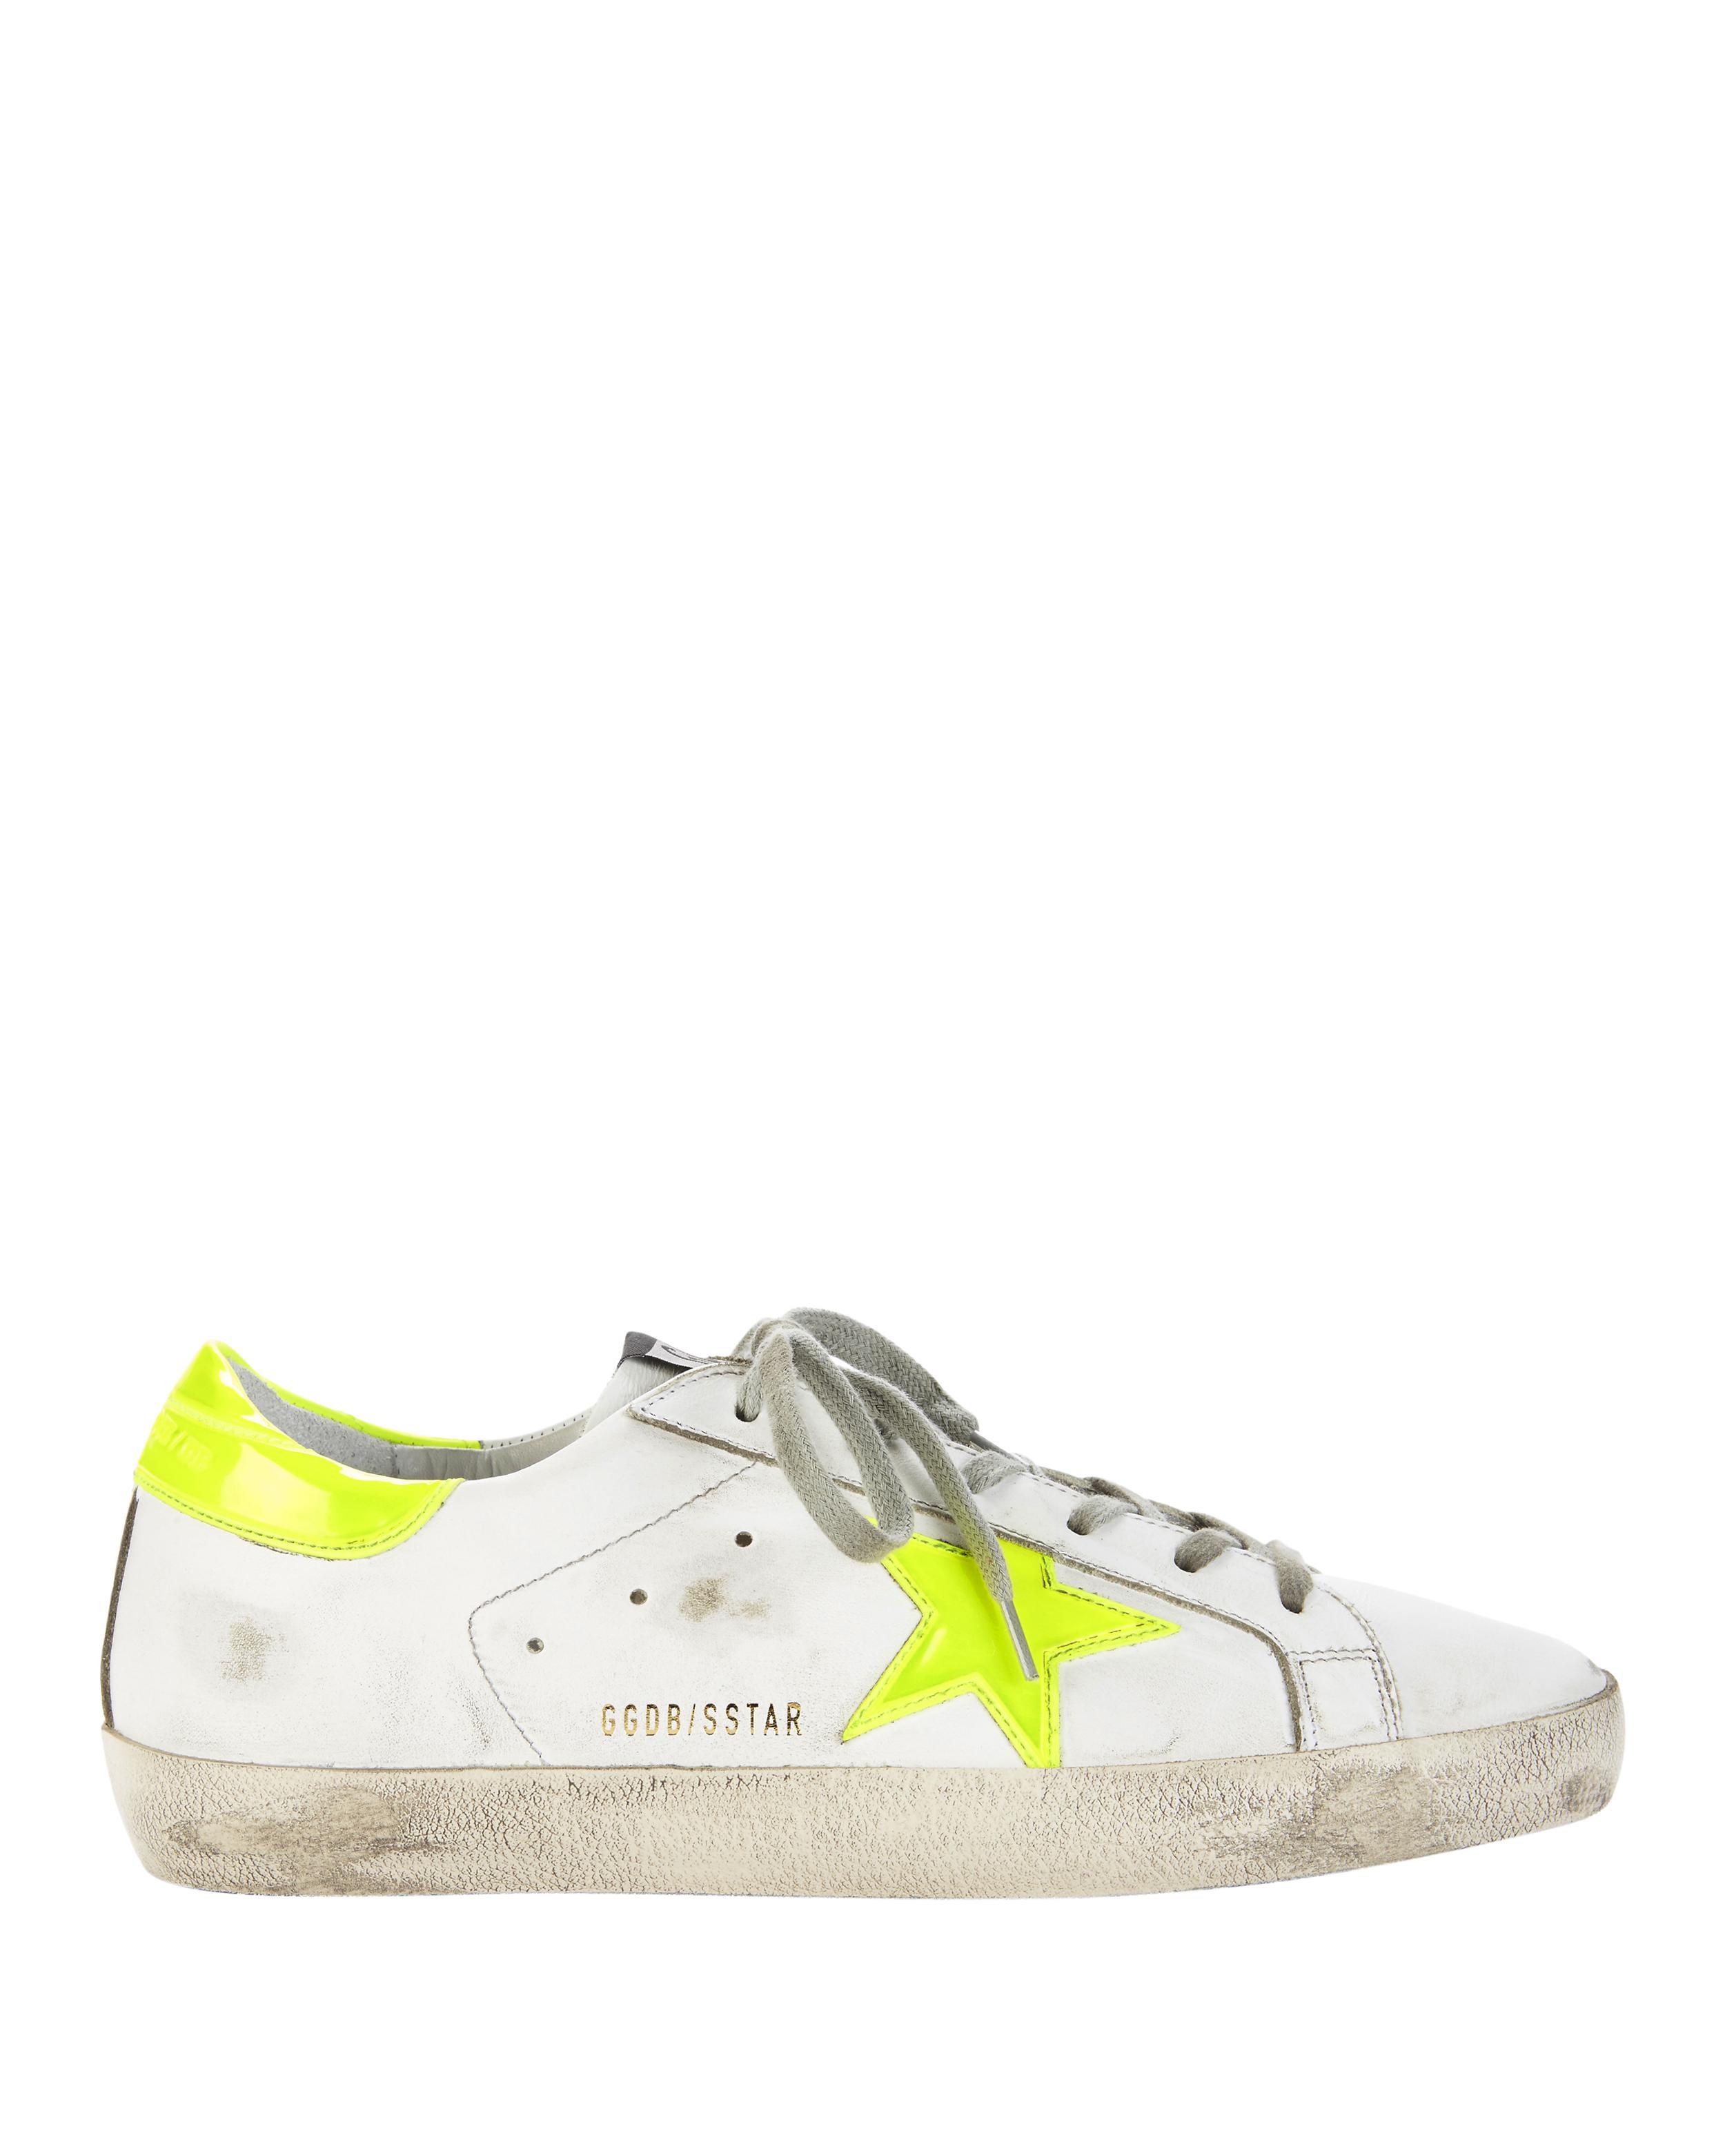 White Neon Yellow Superstar sneakers Golden Goose hbPI9sZG2